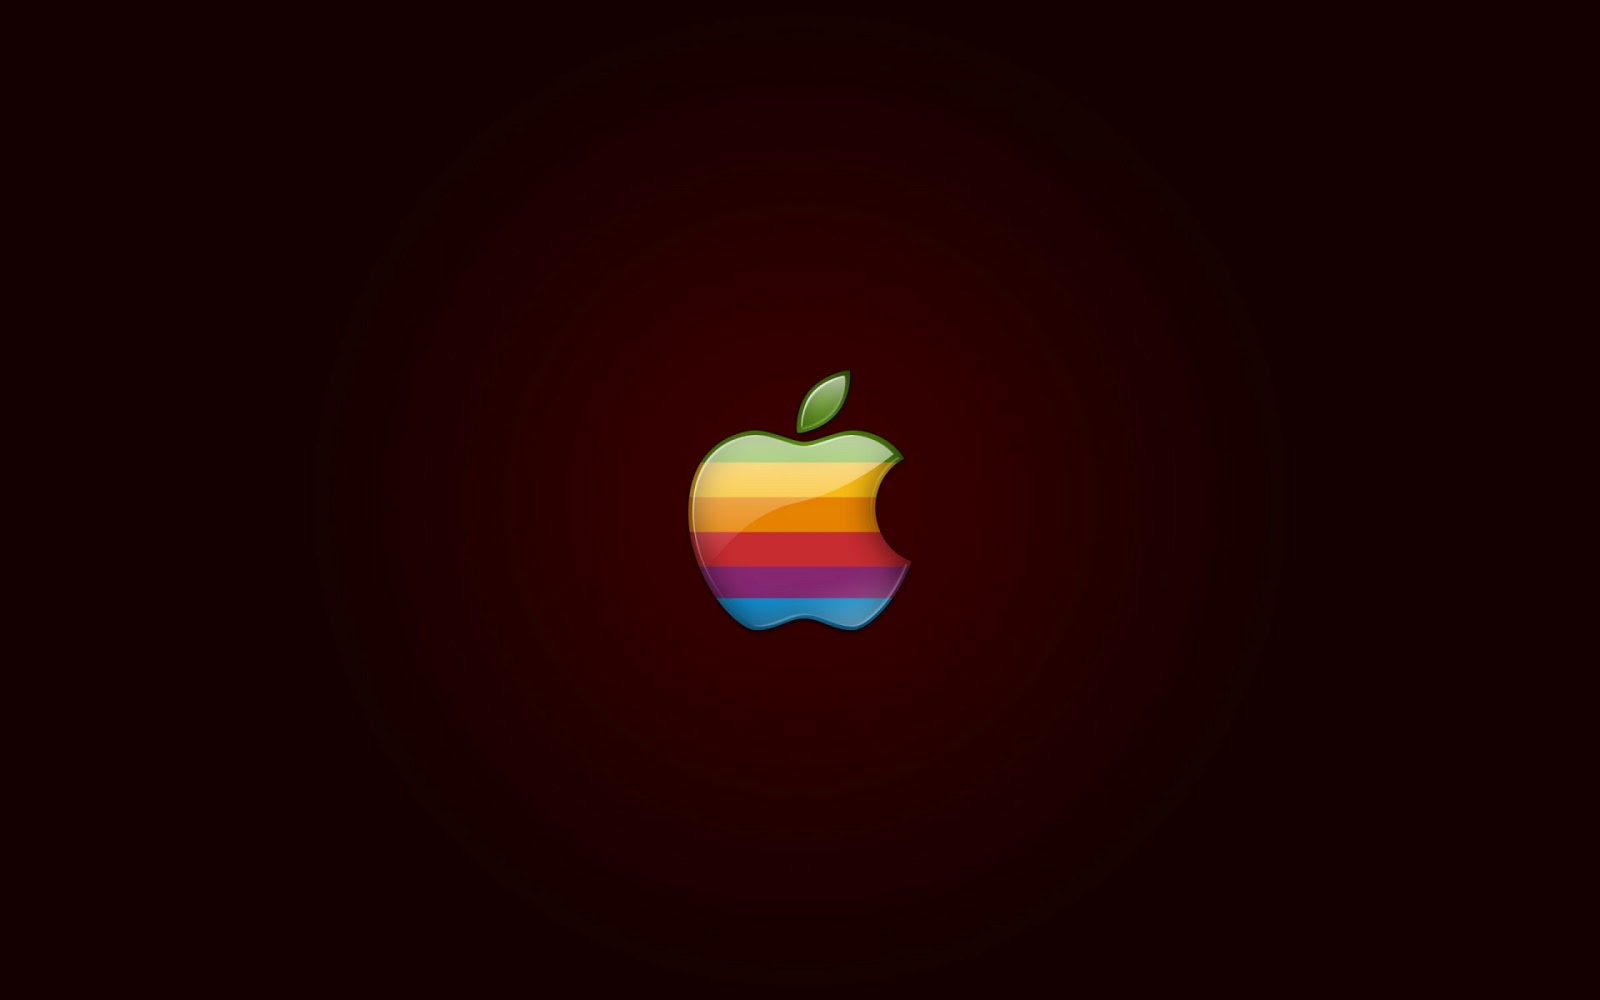 Apple Colorful Logo